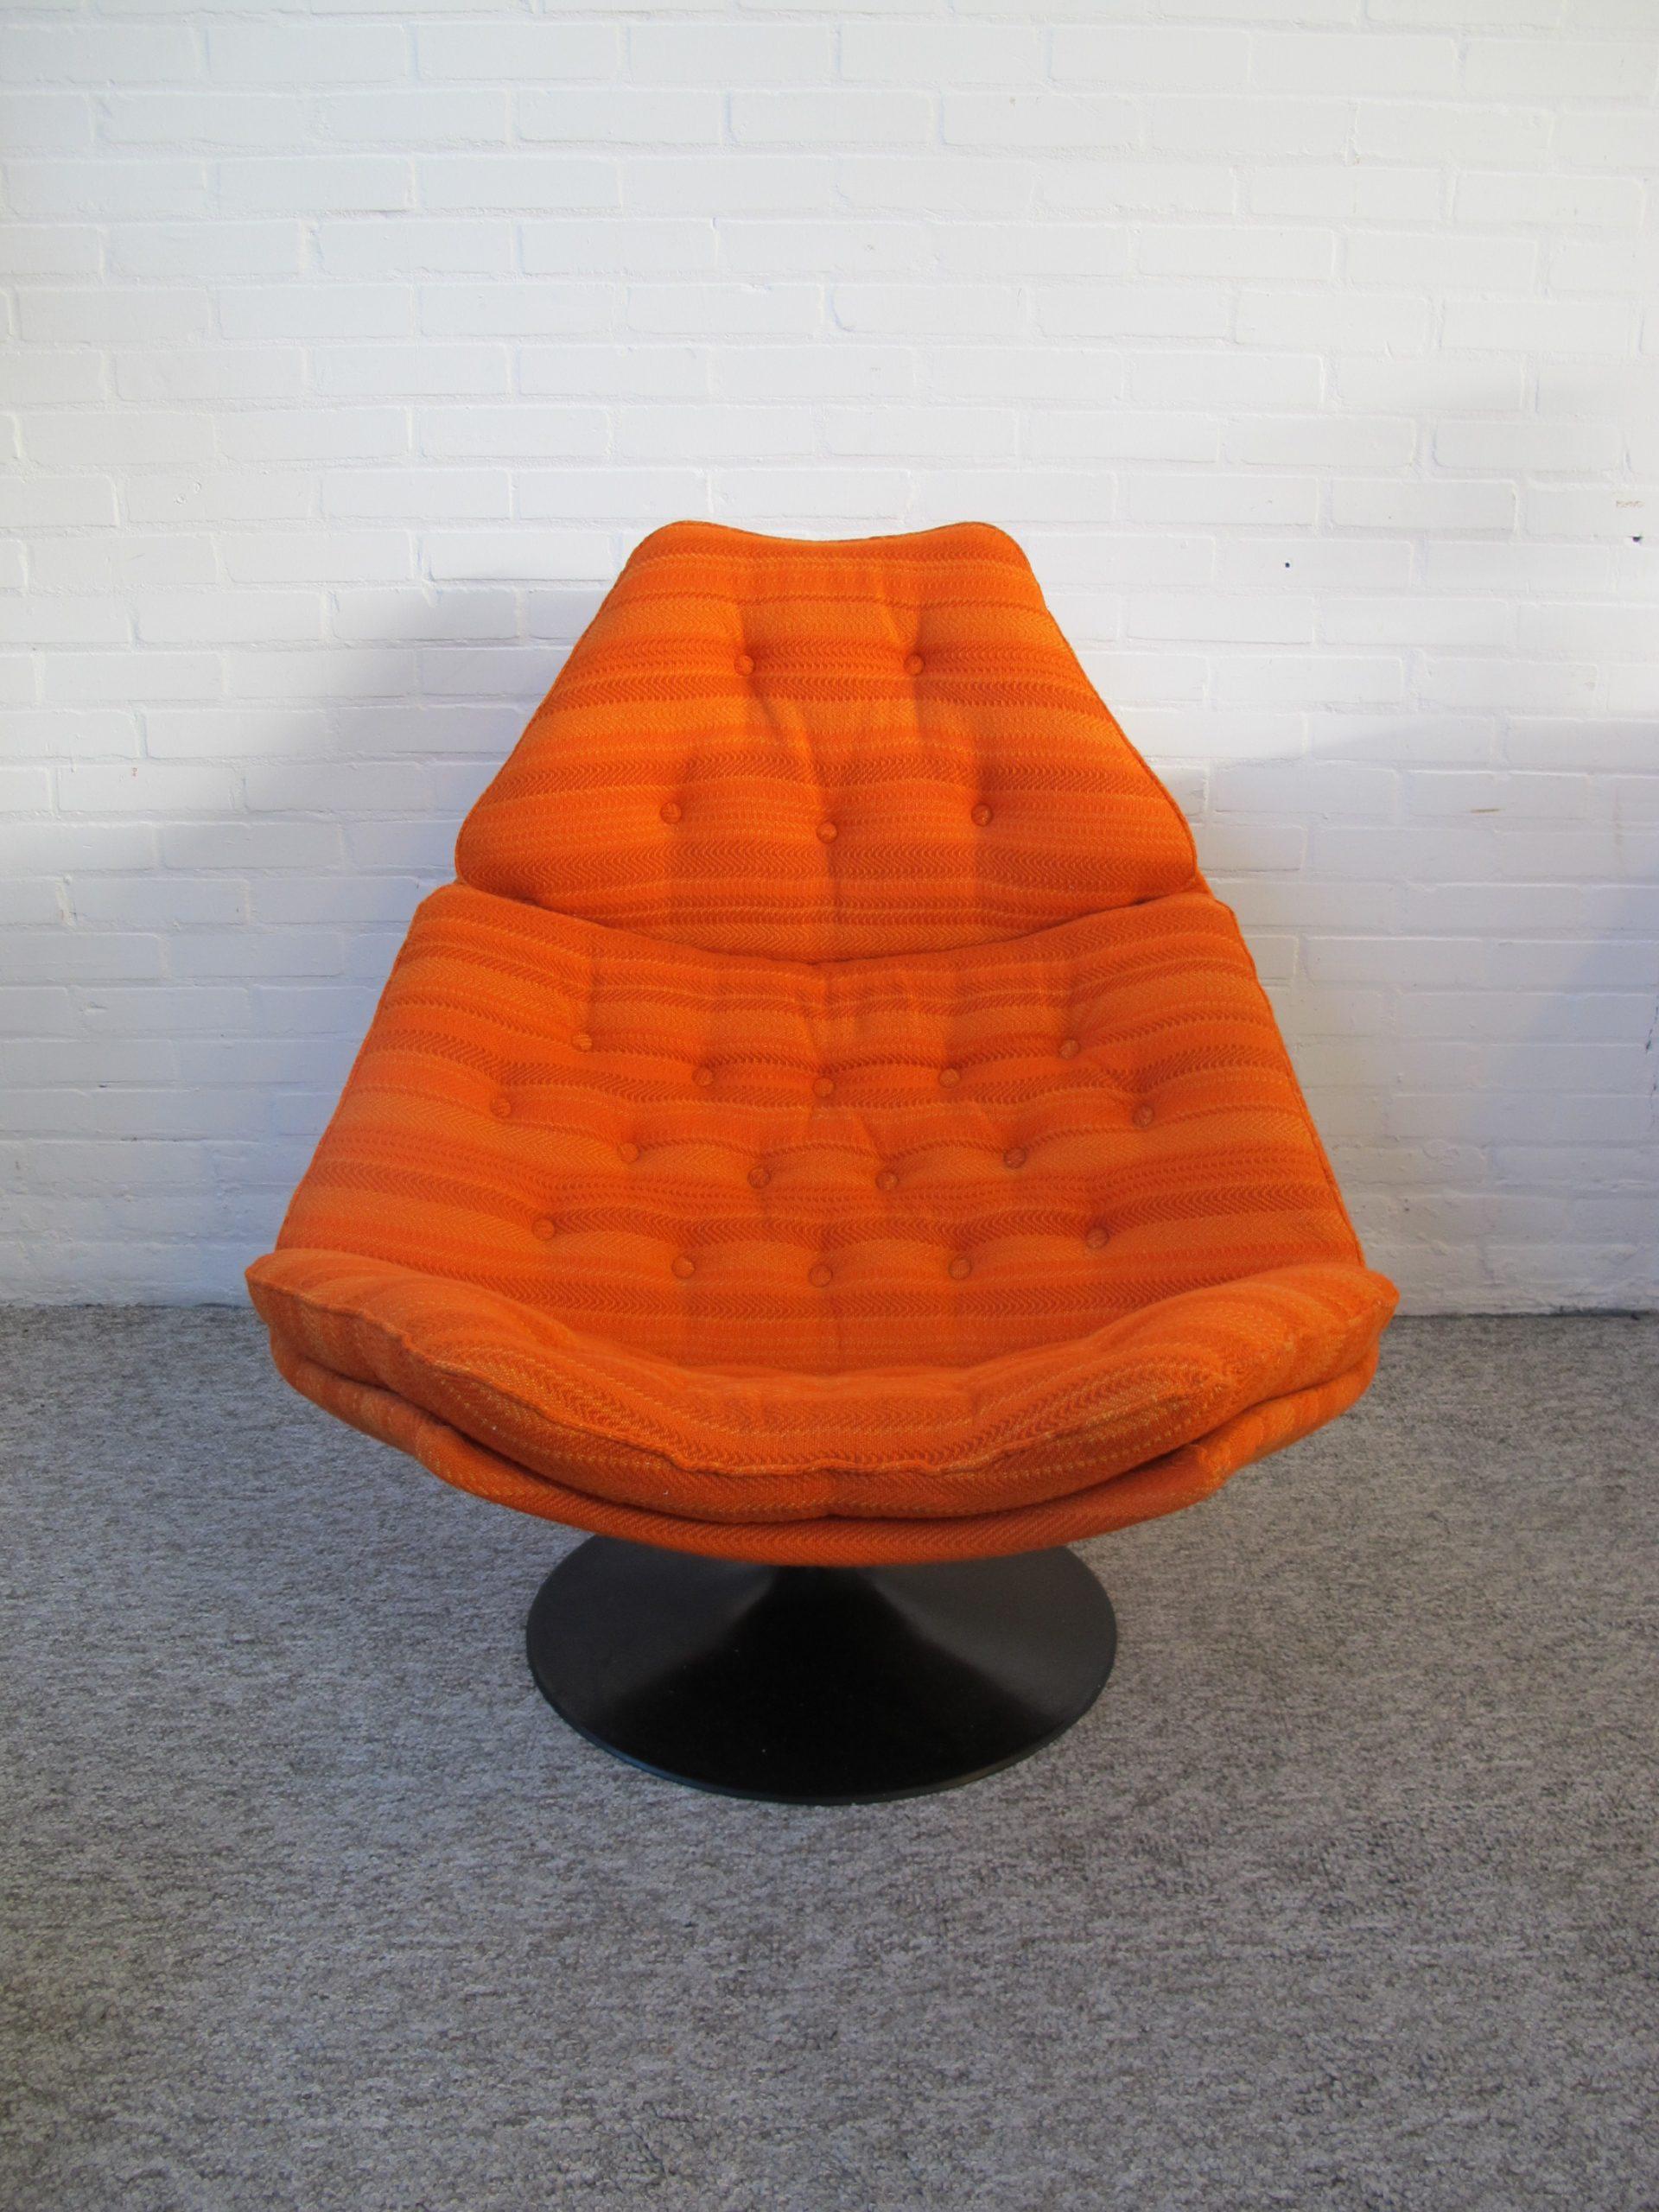 Fauteuil lounge chair Artifort F588 Geoffrey Harcourt vintage midcentury